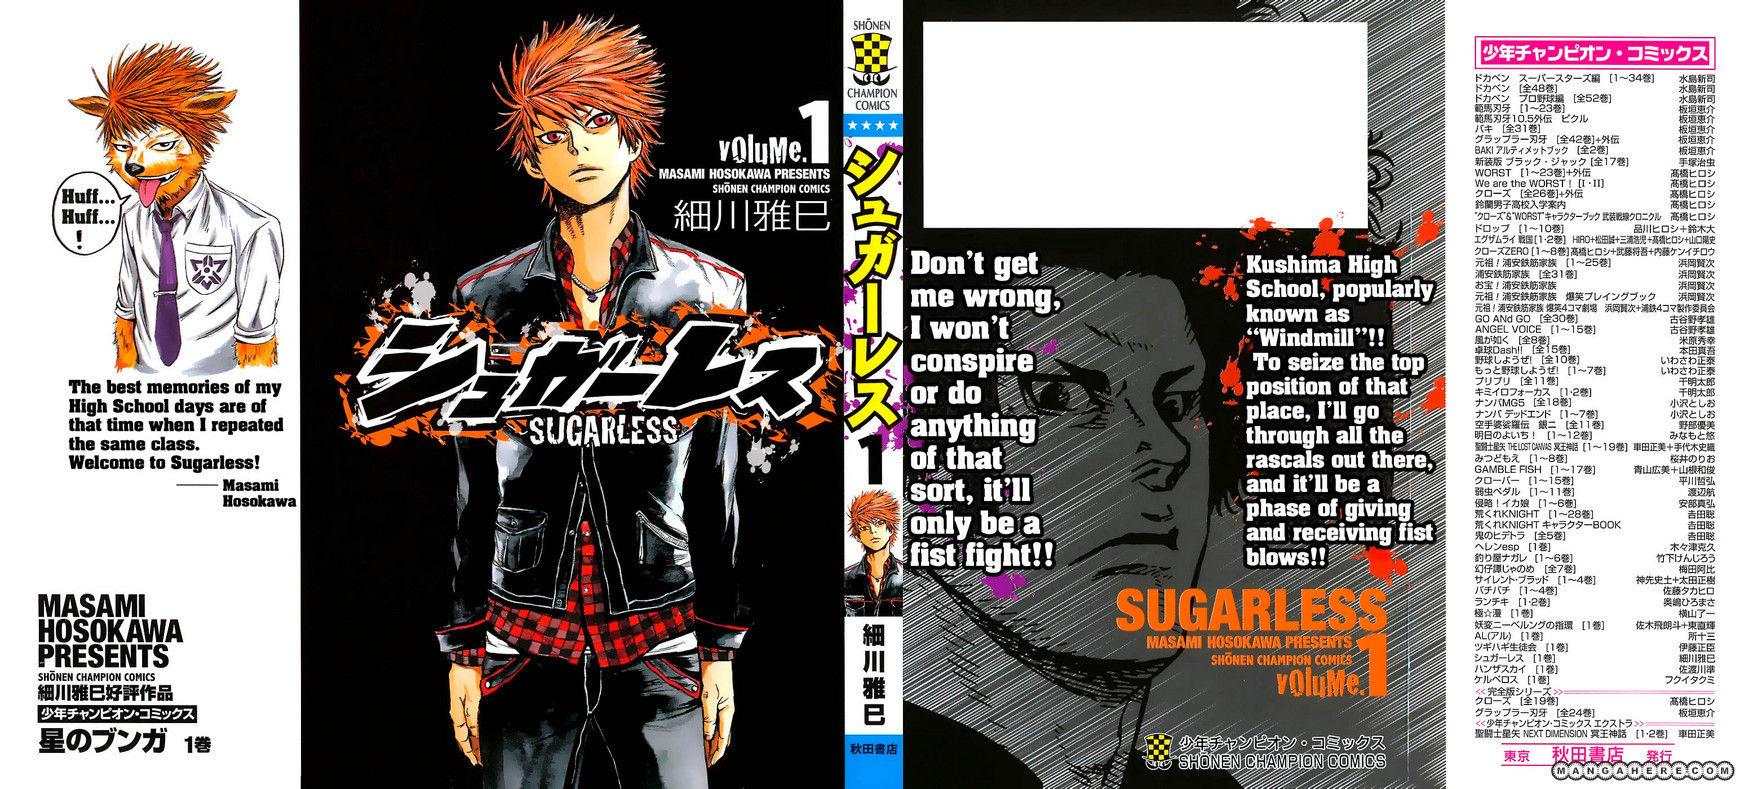 Sugarless (HOSOKAWA Masami) 1.1 Page 1